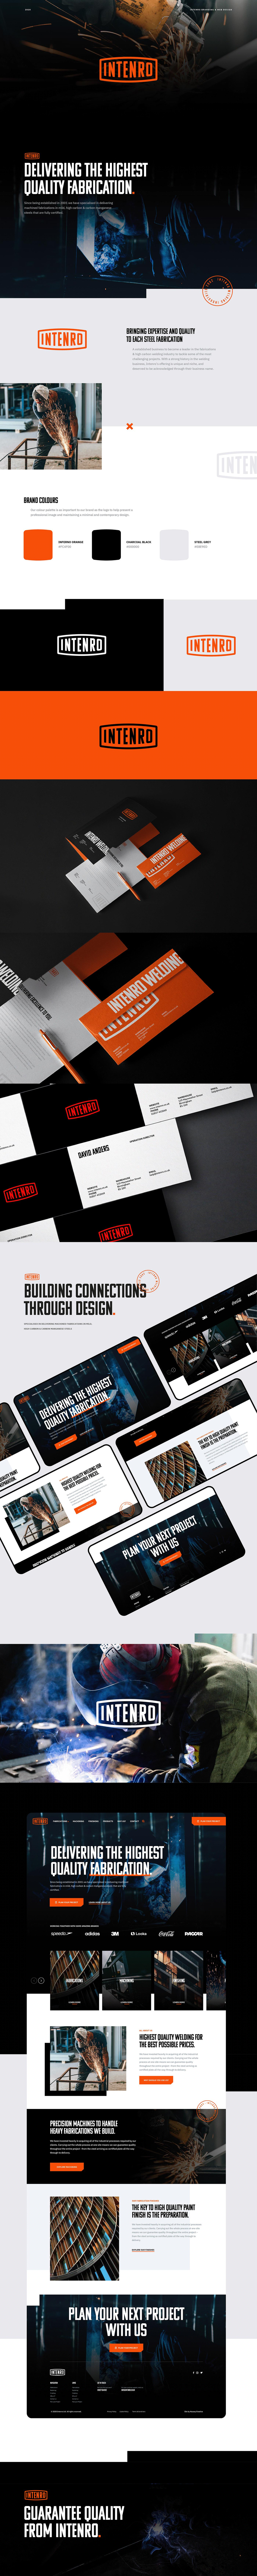 black branding  business Business Cards construction design identity orange Web Design  welding